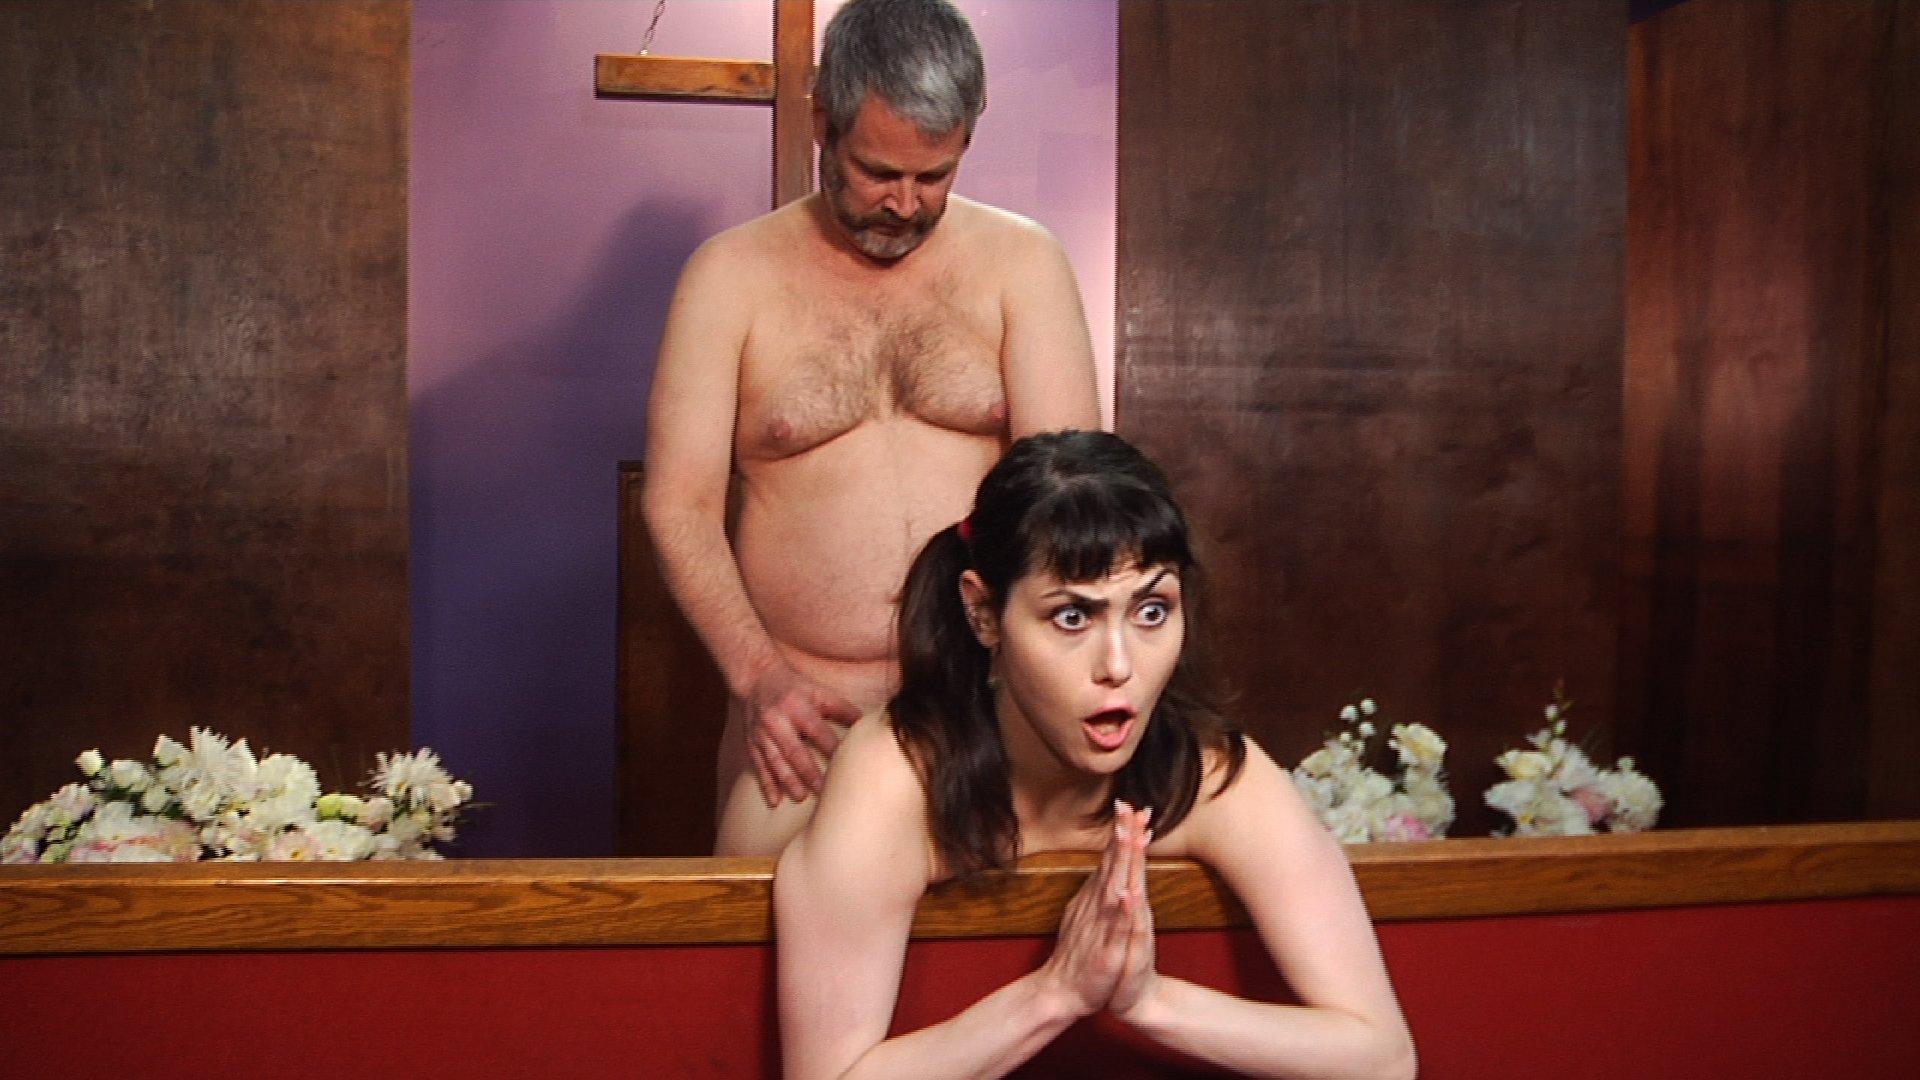 Revenge on the Priest: Part 1 of 3